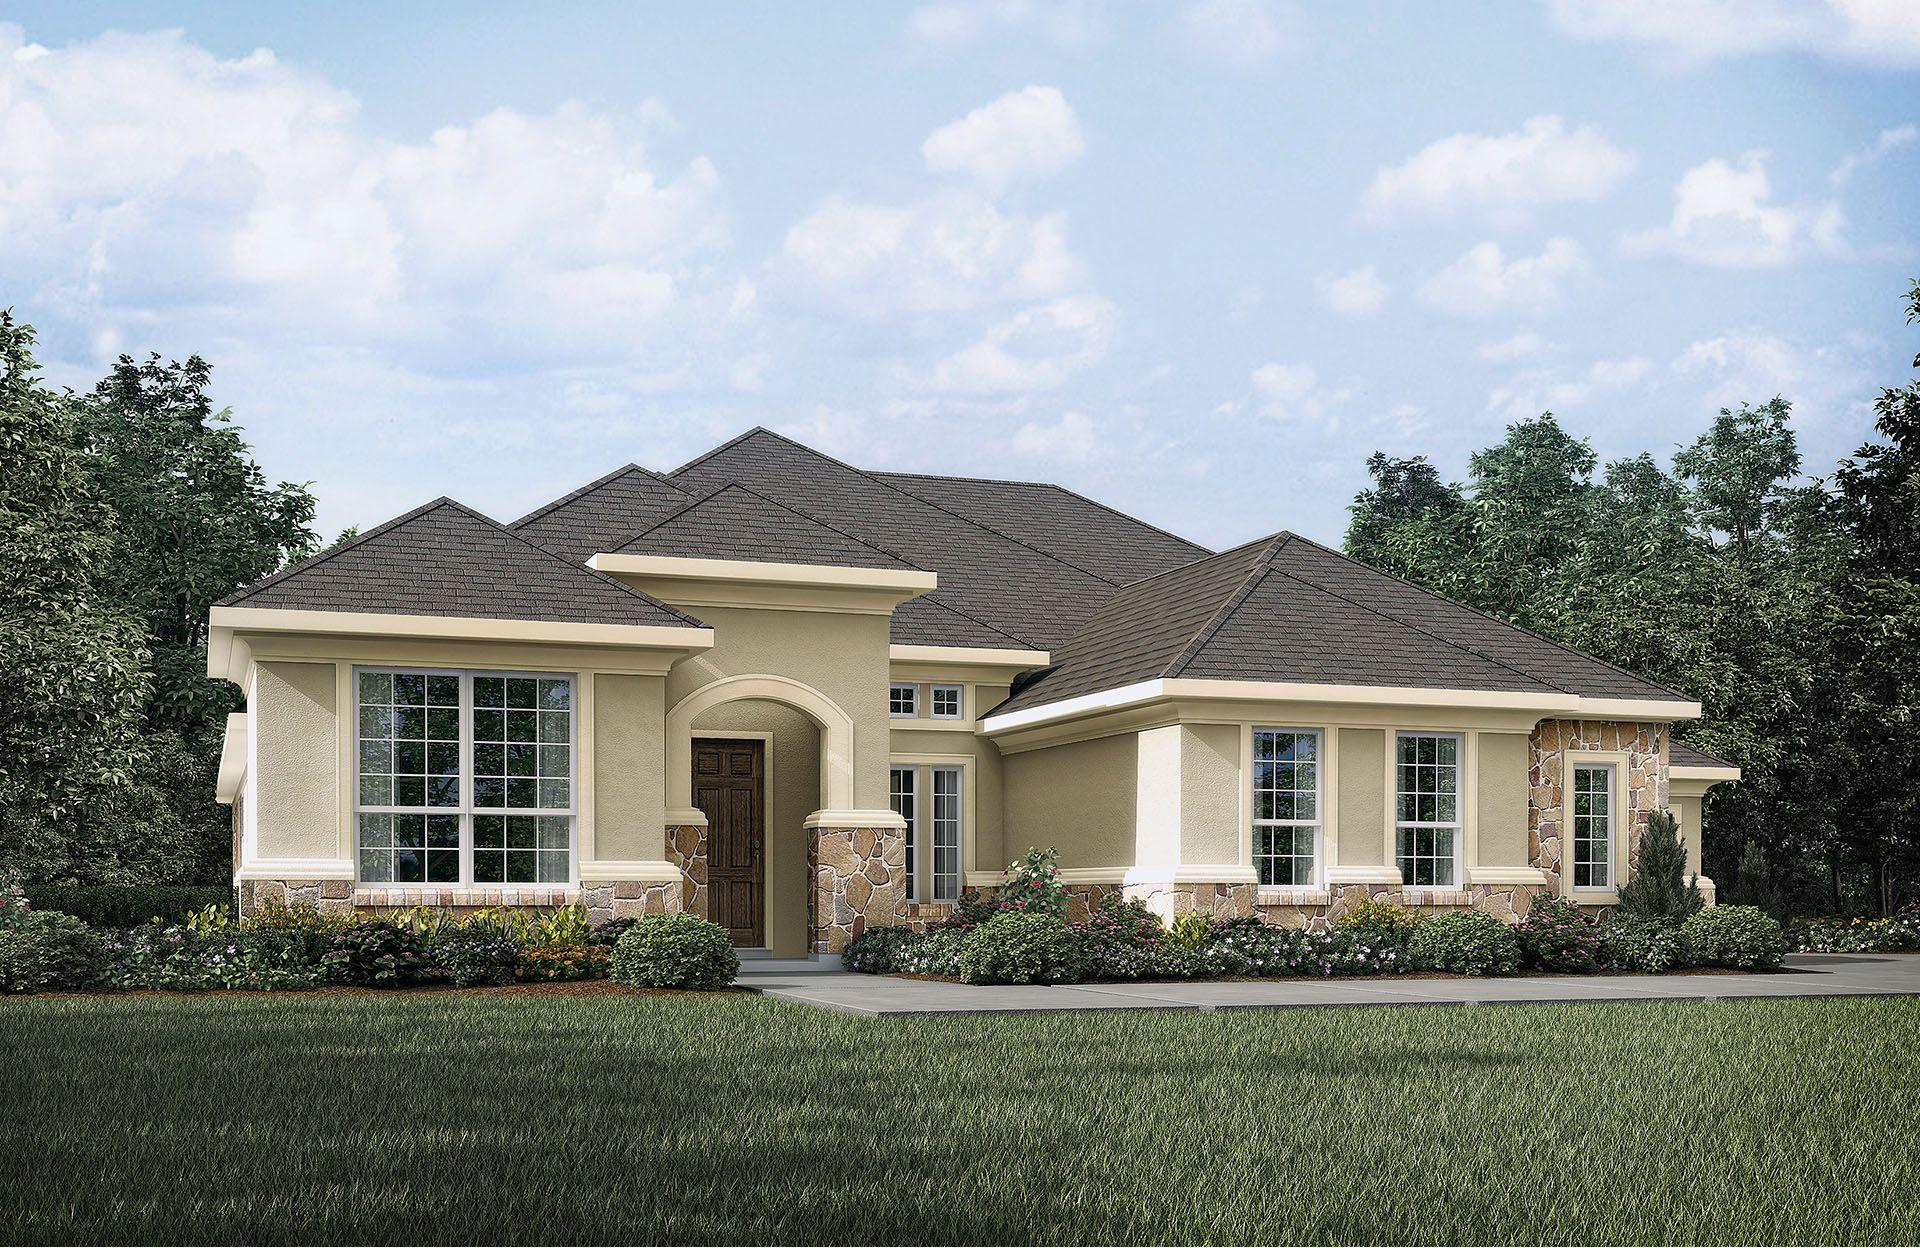 Single Family for Sale at Cimarron Hills - Lauren Ii 307 Flint Ridge Georgetown, Texas 78628 United States